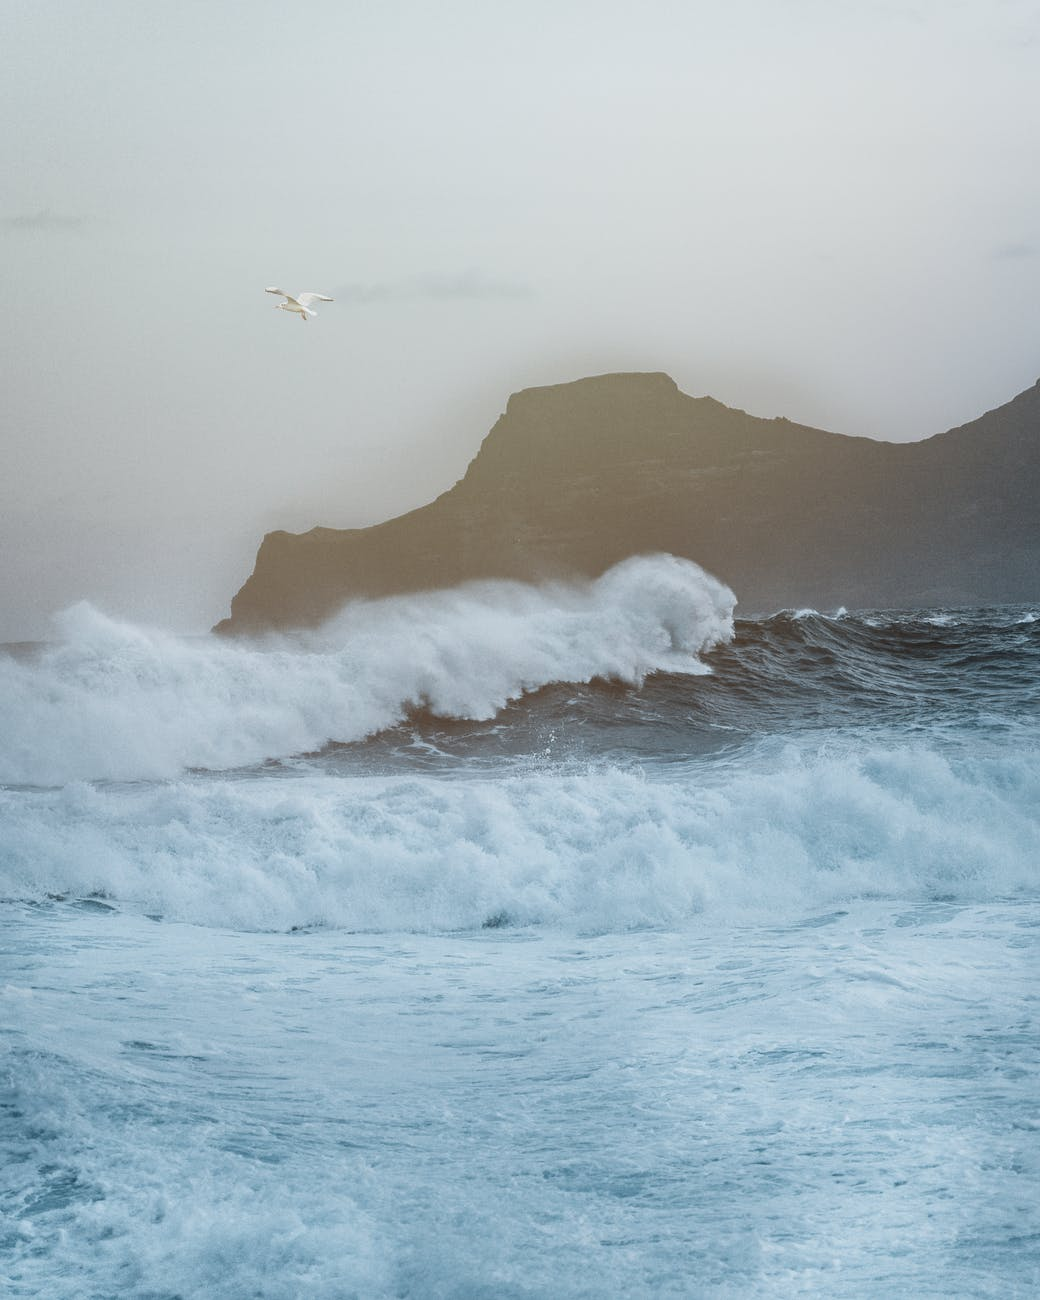 stormy sea waving near rocky cliff